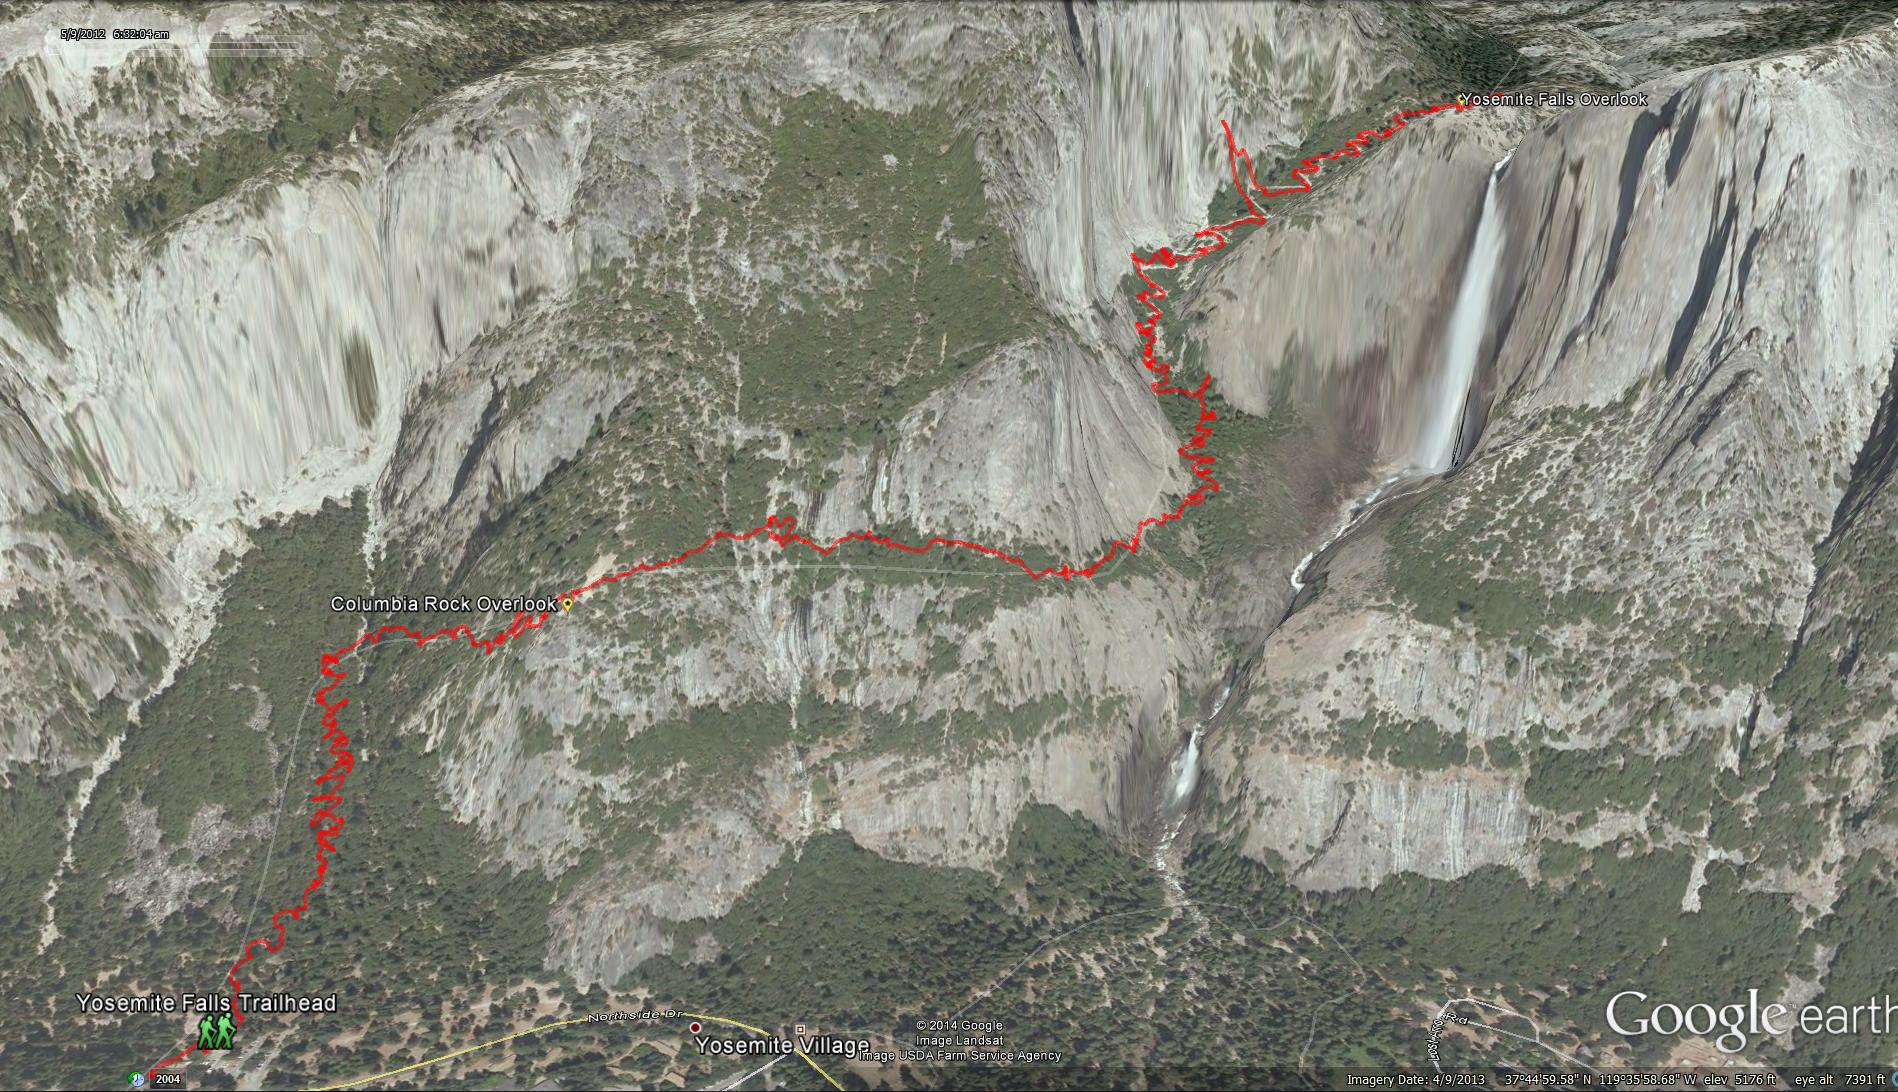 Yosemite falls upper yosemite falls trail publicscrutiny Choice Image